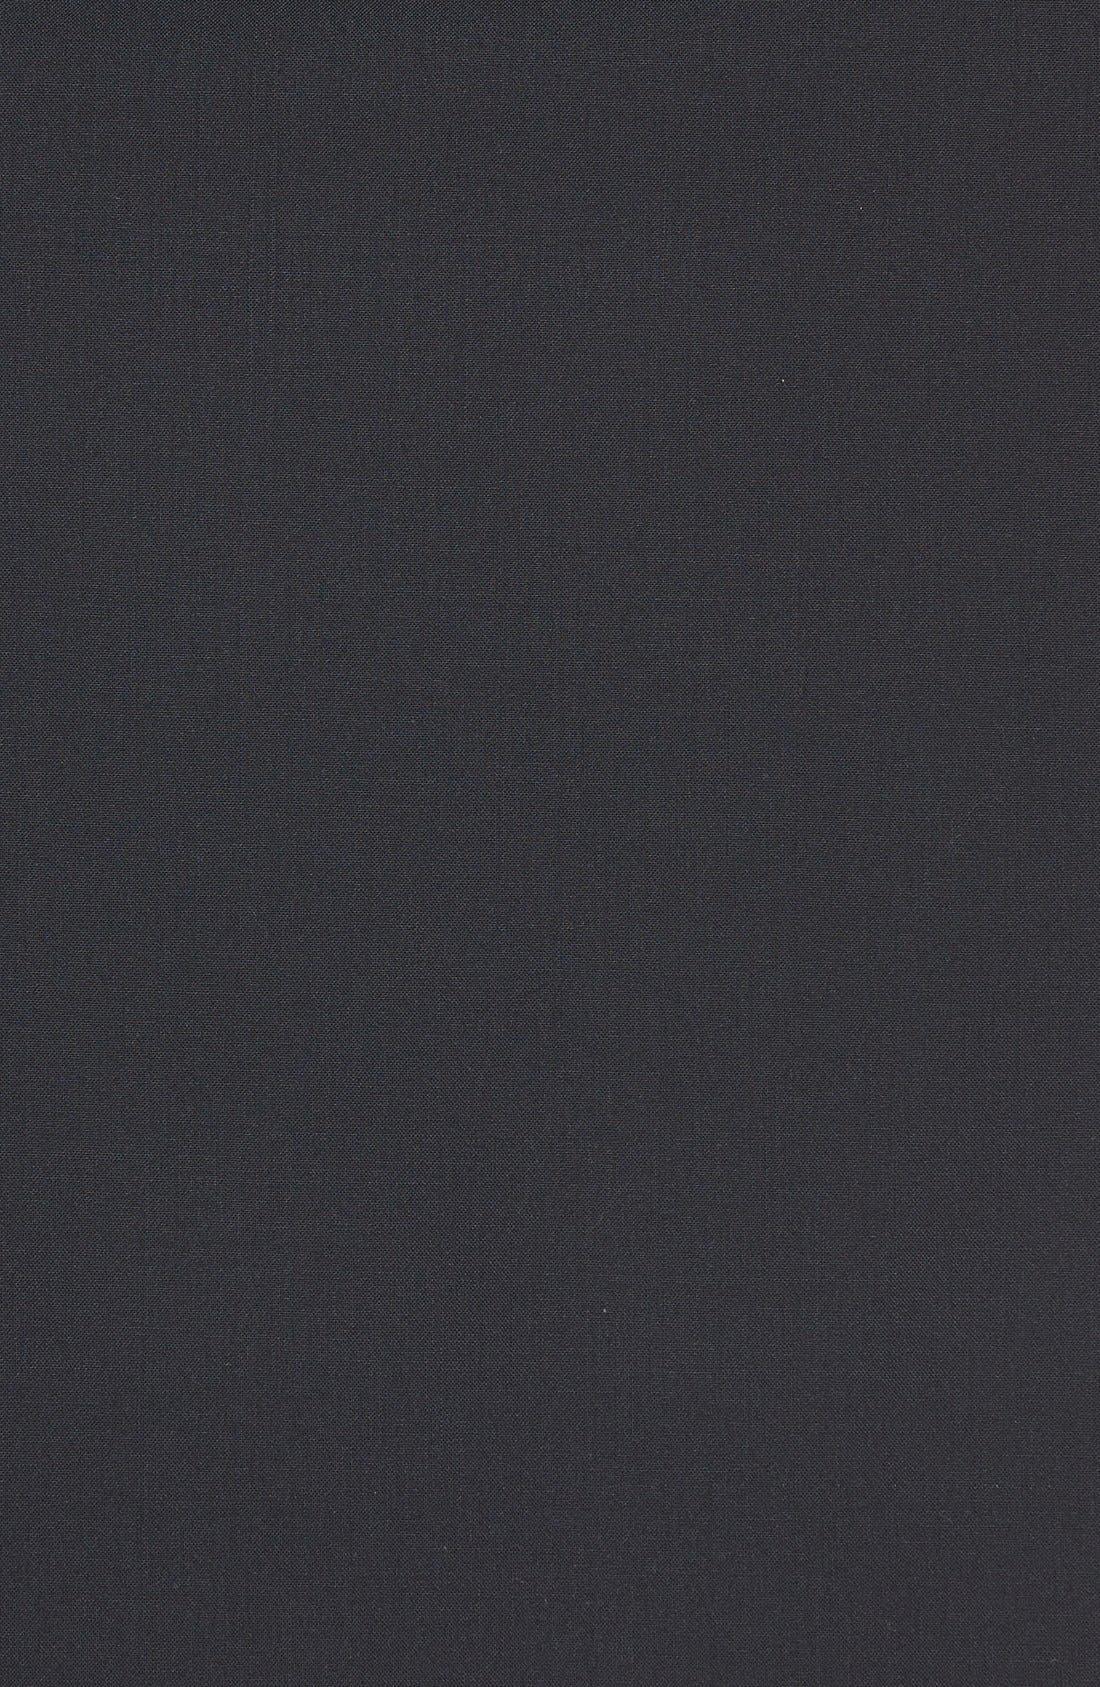 Alternate Image 3  - Theory 'Joanie' Stretch Wool Pencil Skirt